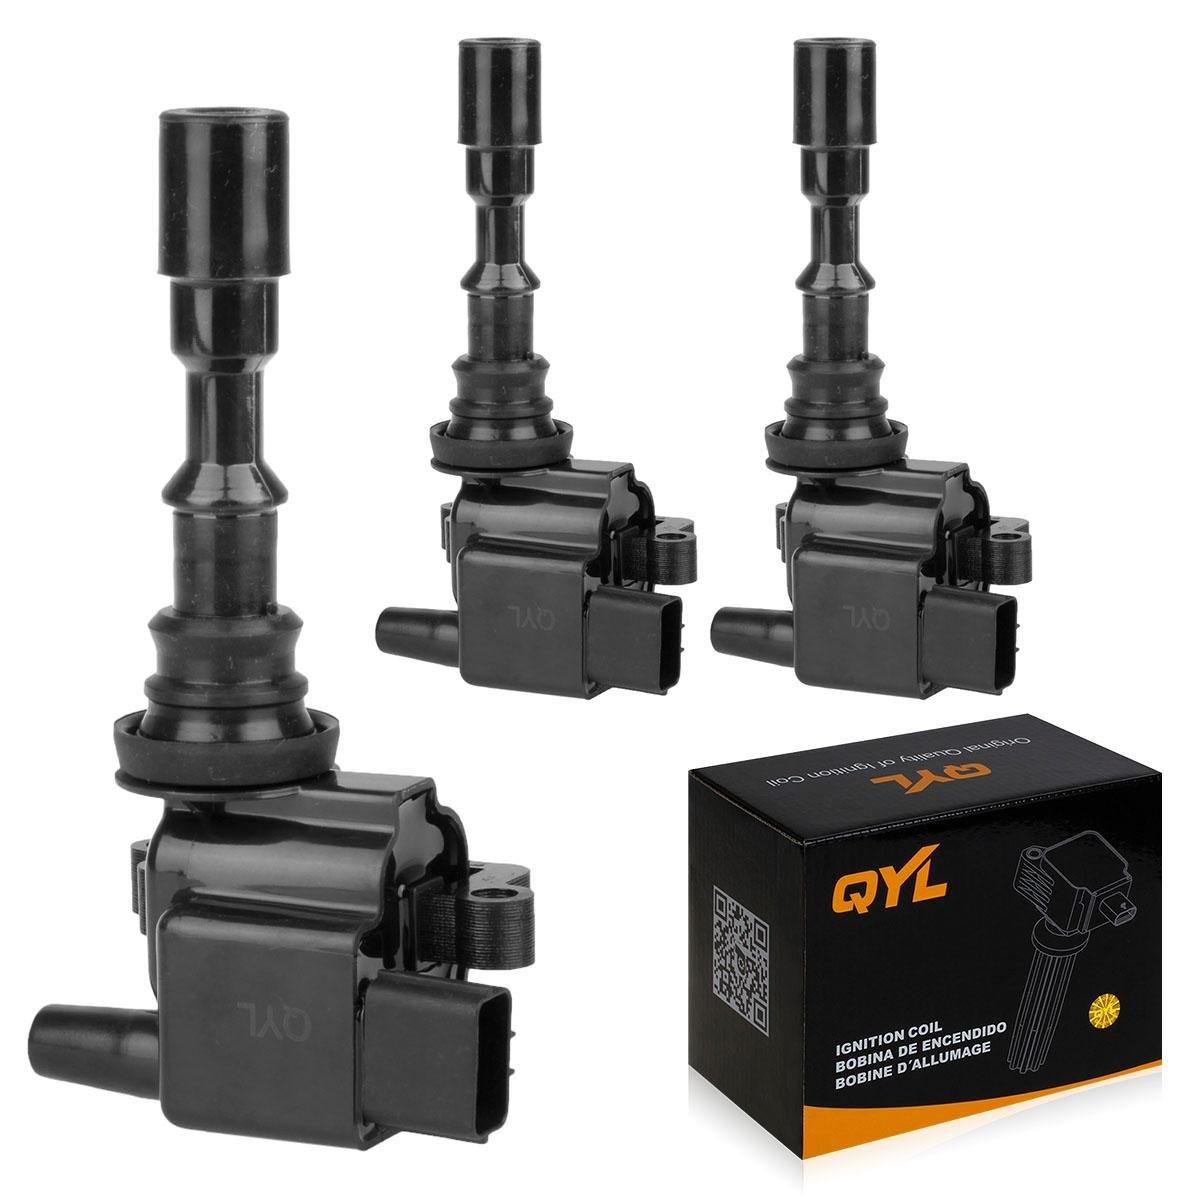 3pcs Ignition Coil Pack Replacement for 02 03 04 05 Kia Sedona 01 02 Hyundai XG300 XG350 3.0L 3.5L V6 UF432 5C1159 C1353 UF-432 QYL